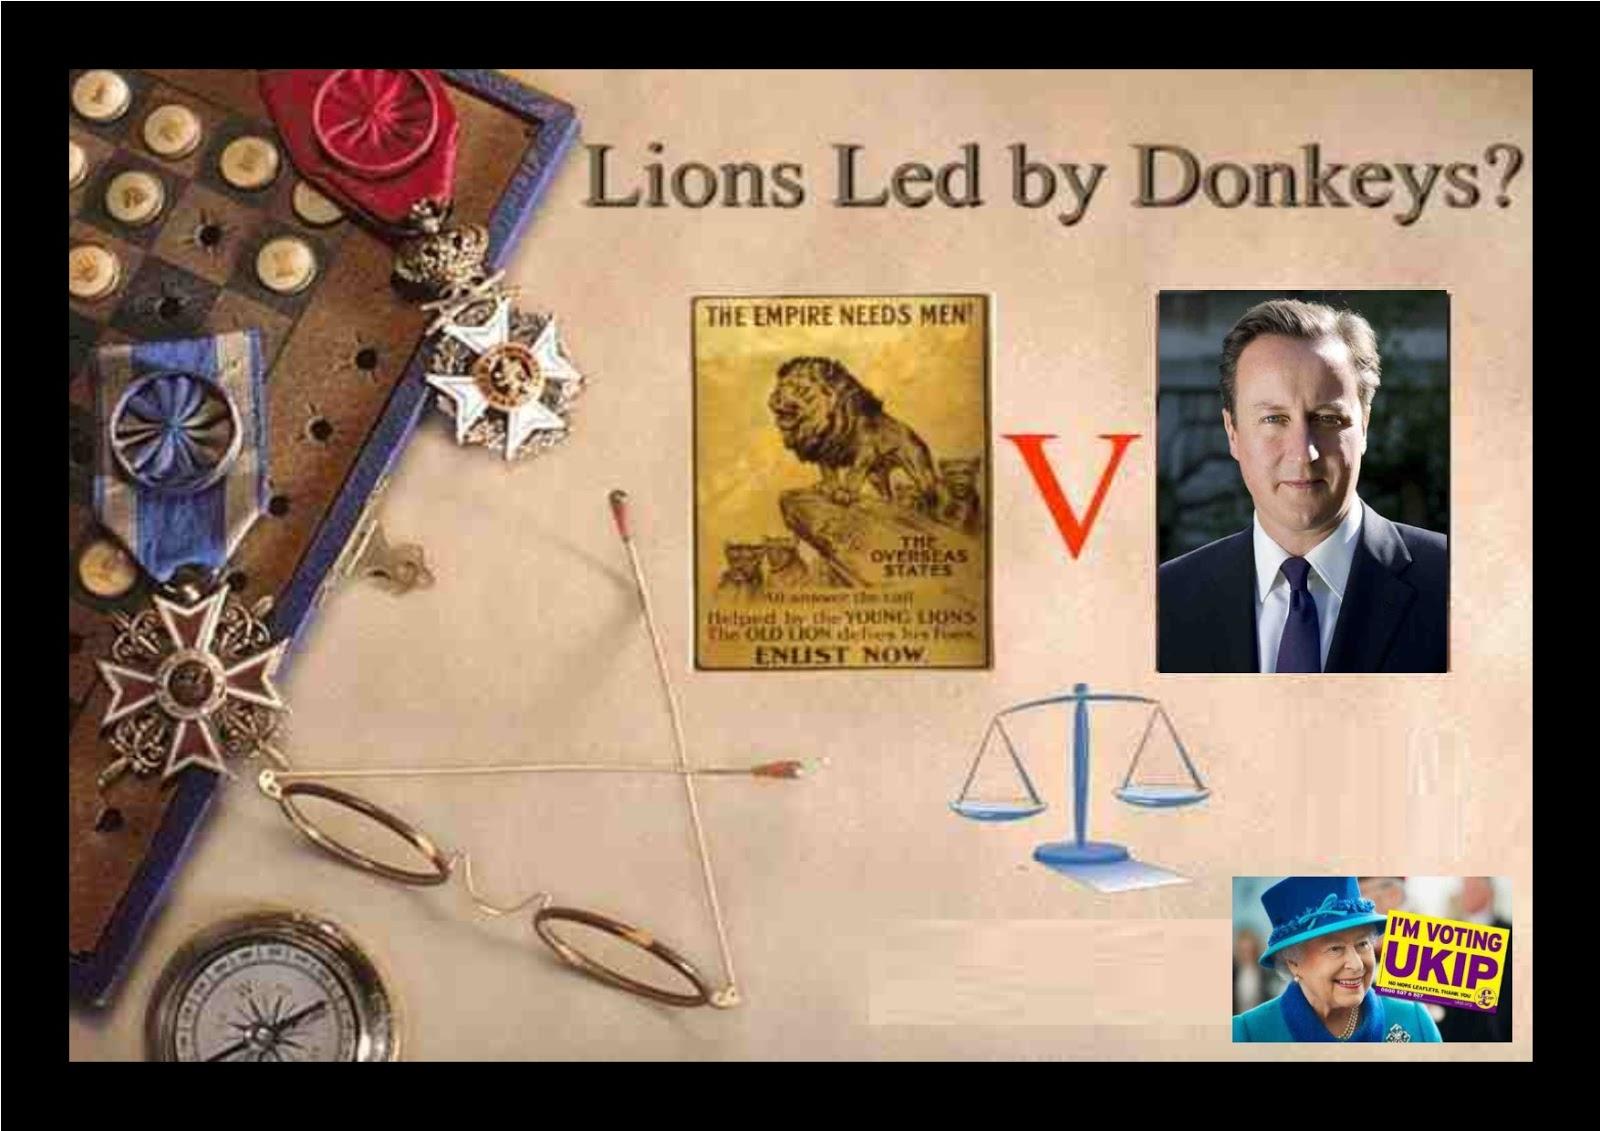 Lions Led by Donkeys